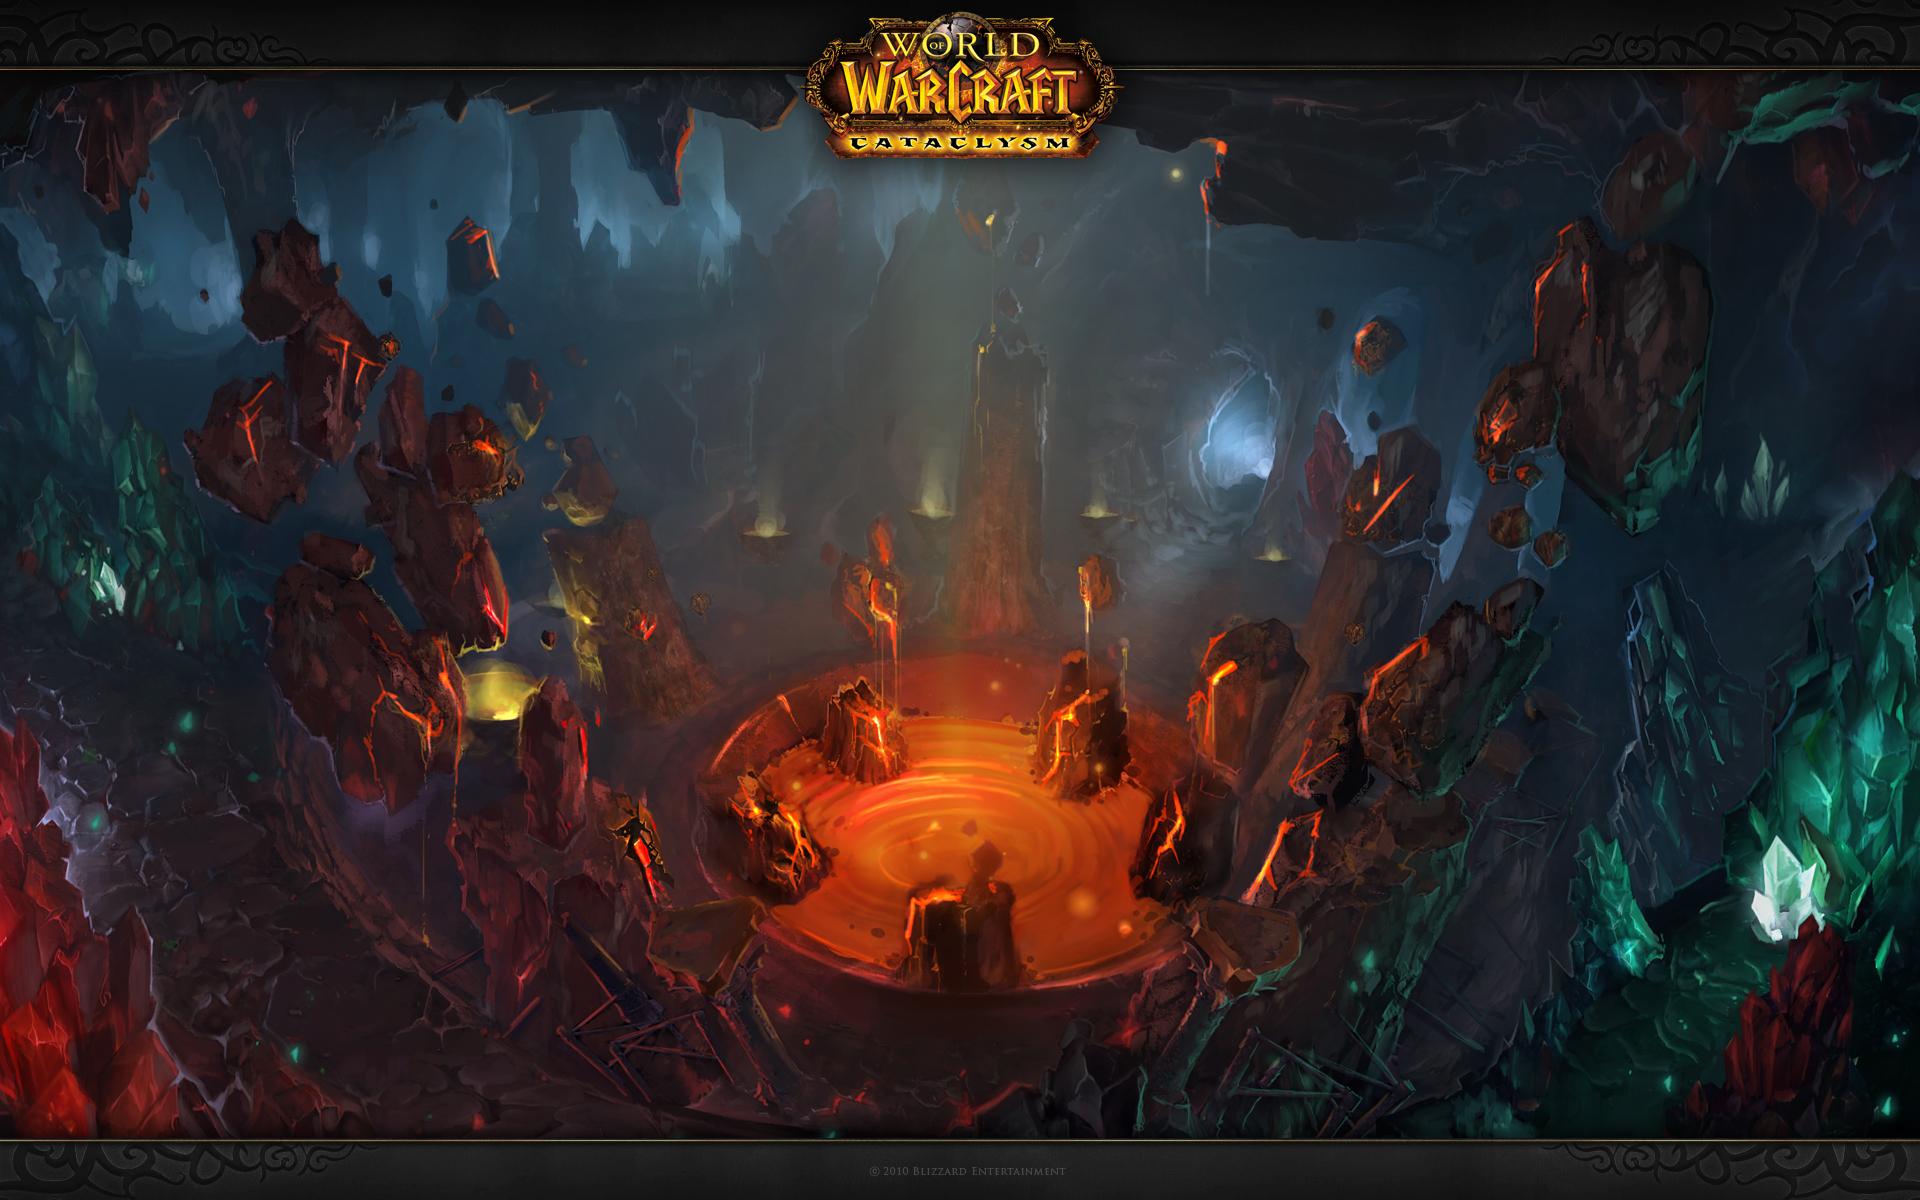 World of Warcraft wallpaper 8